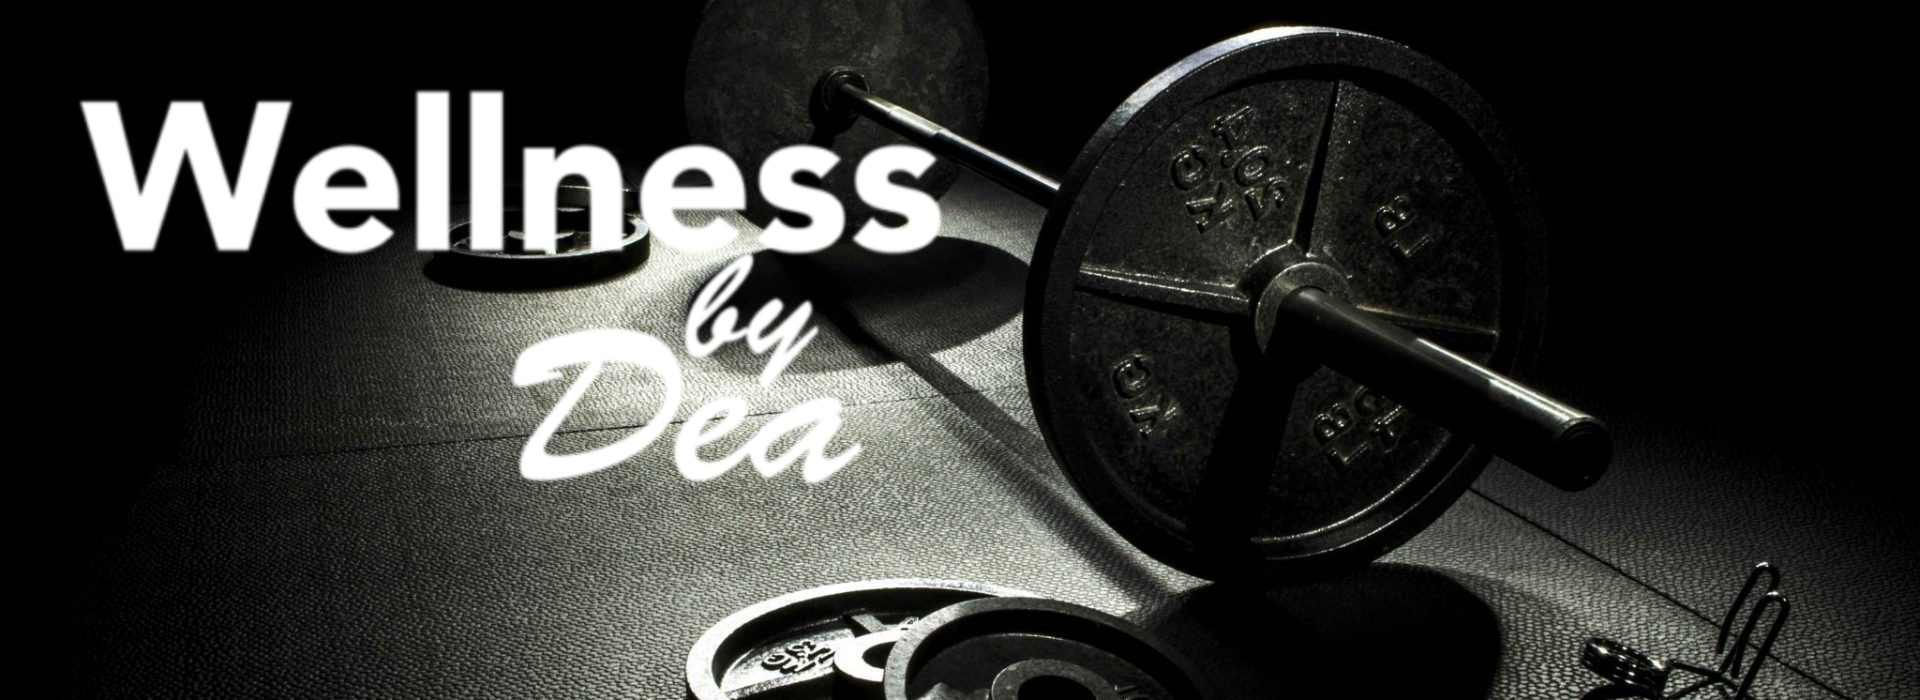 Wellness By Dea